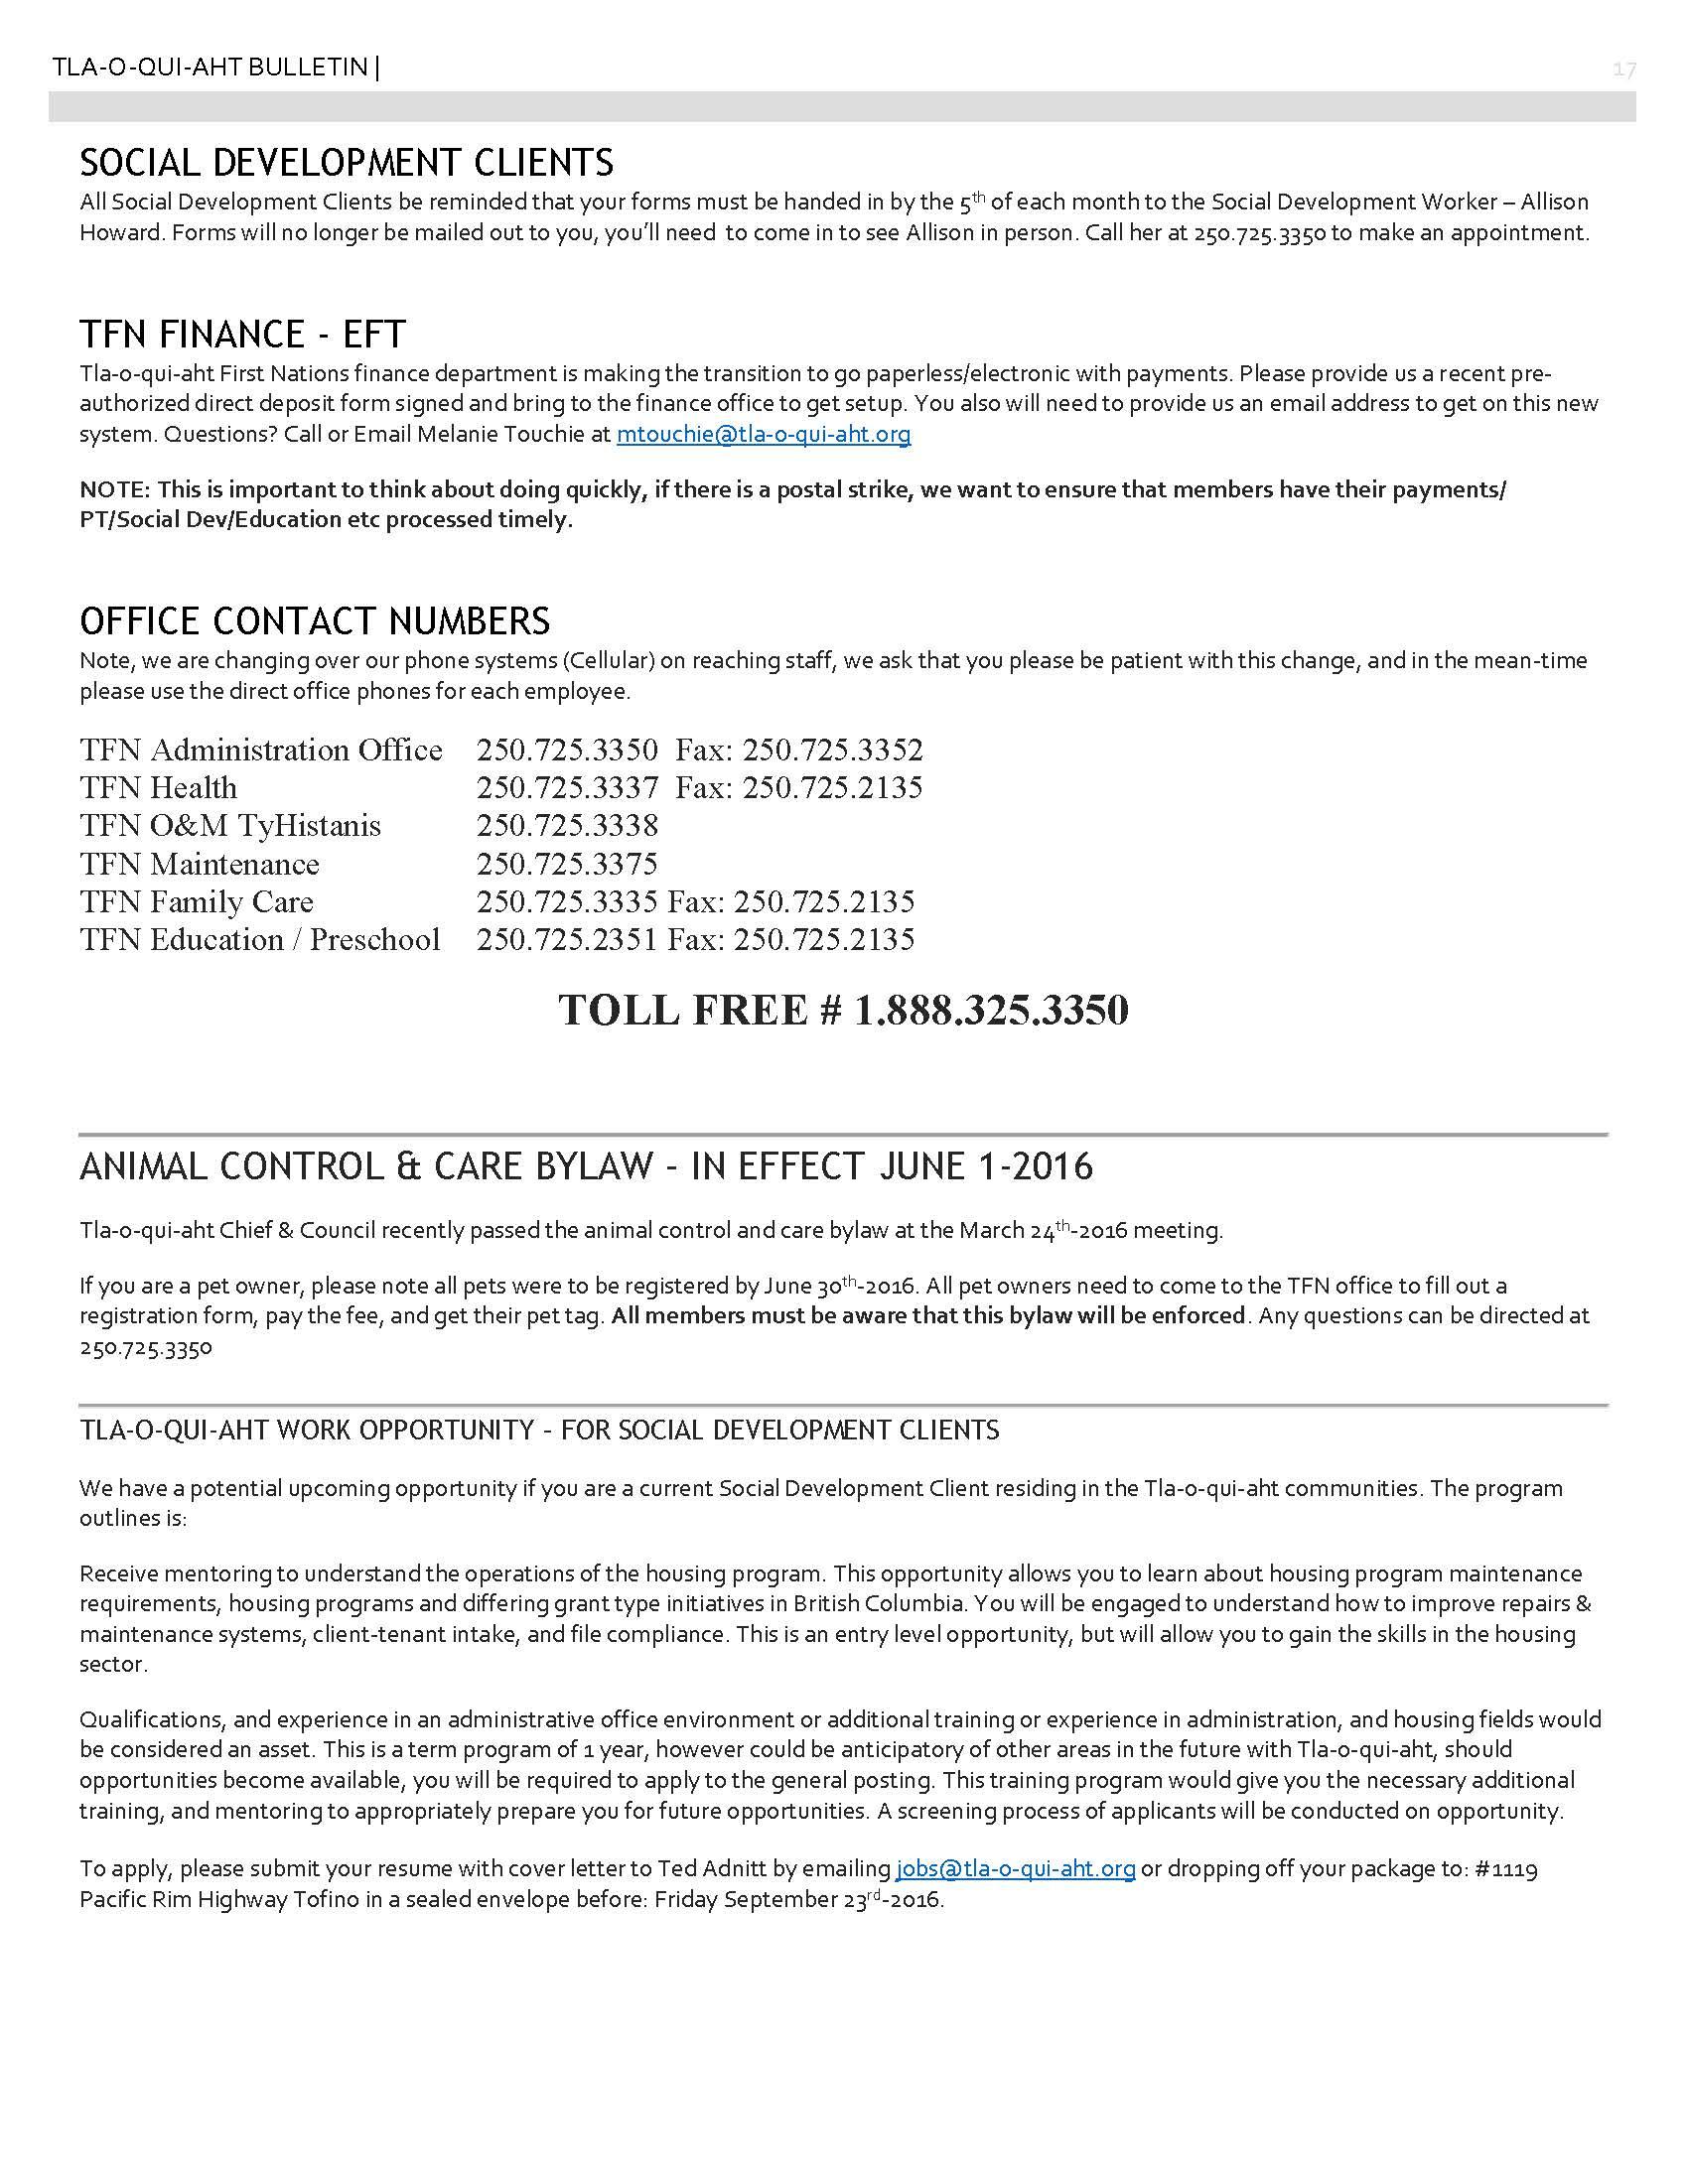 TFN Bulletin Sept 19-2016_Page_17.jpg